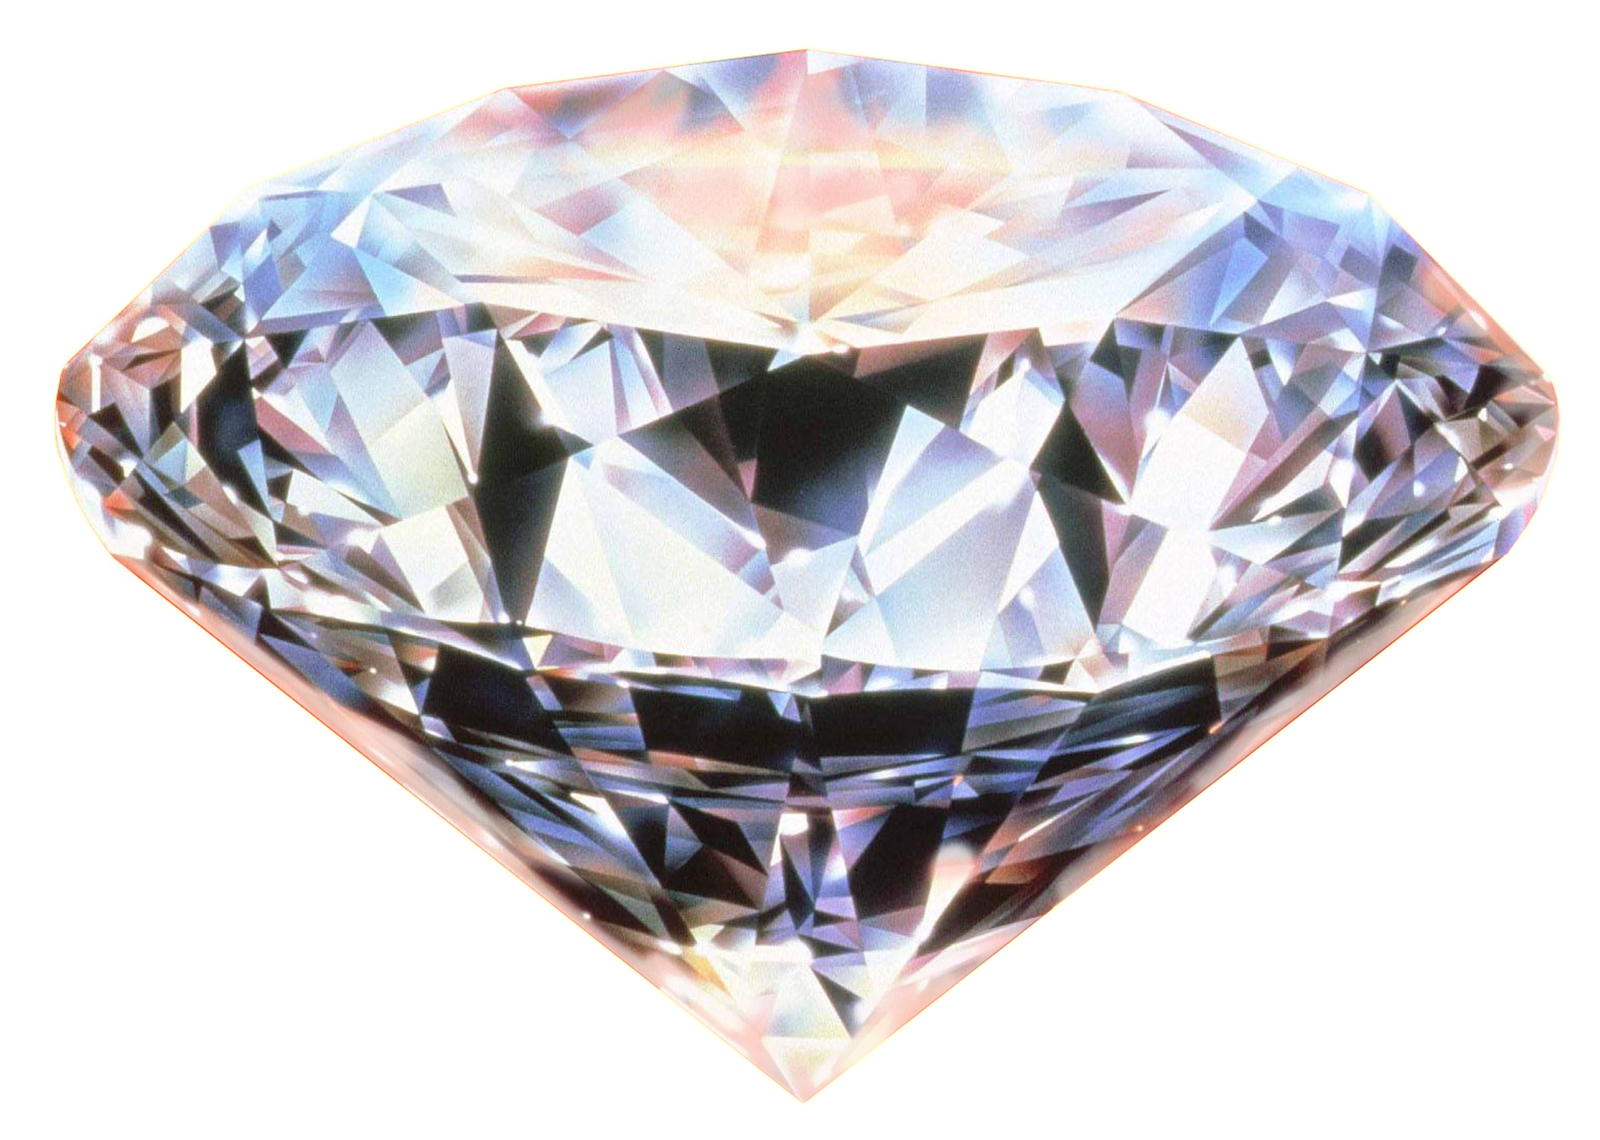 Diamond HD PNG - 120189